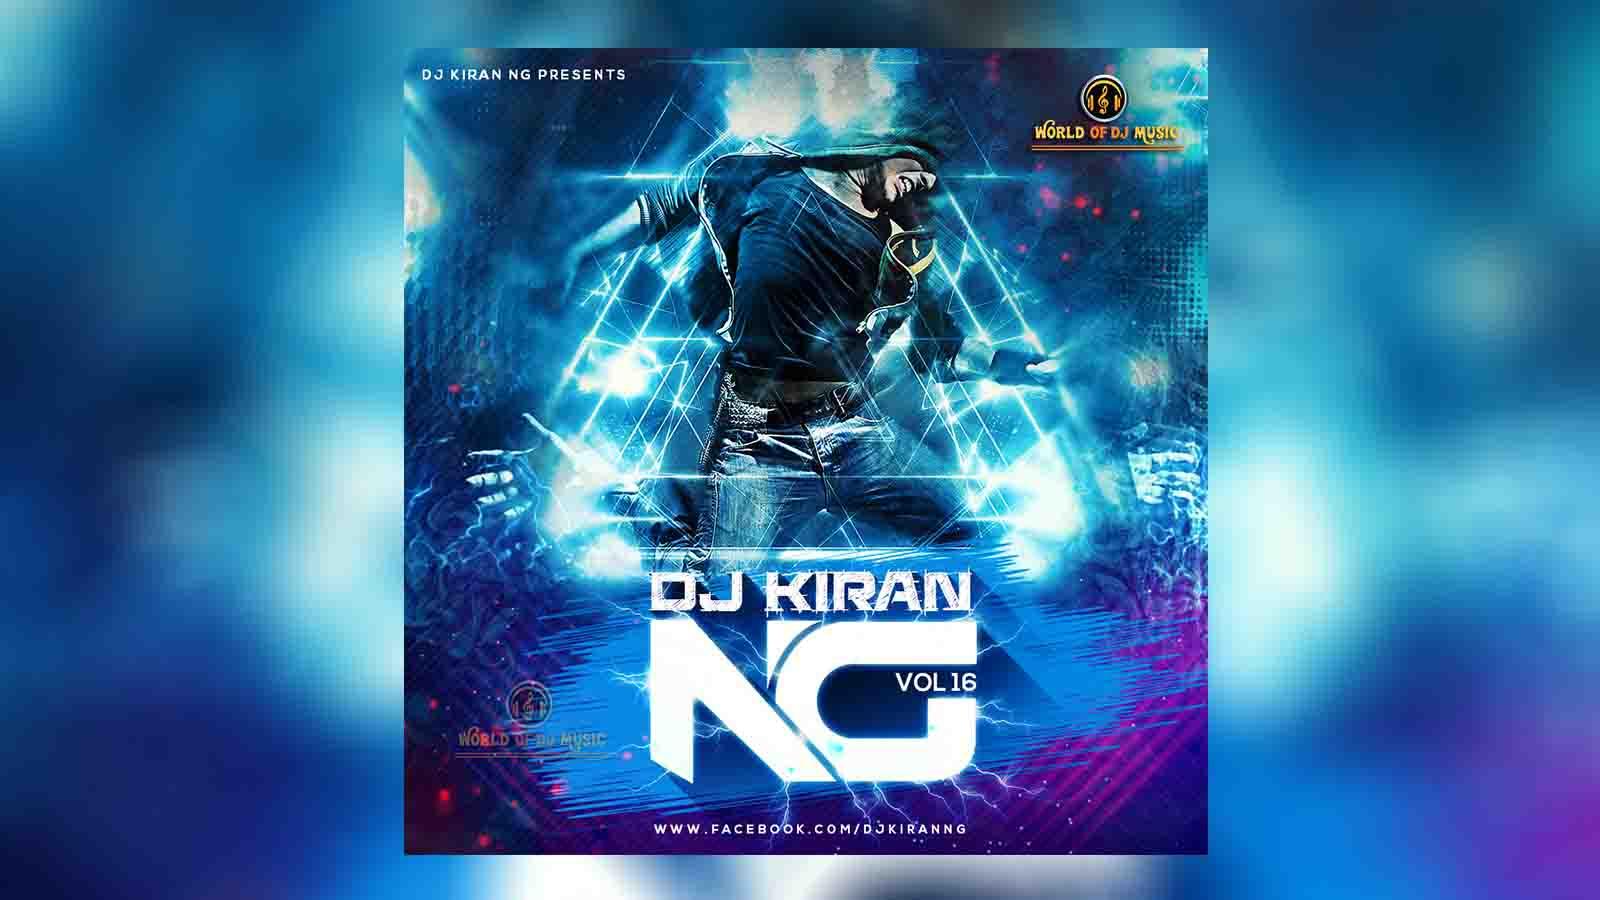 Khalnayak (Compition Mix) - Dj Kiran (NG) & Dj Ash